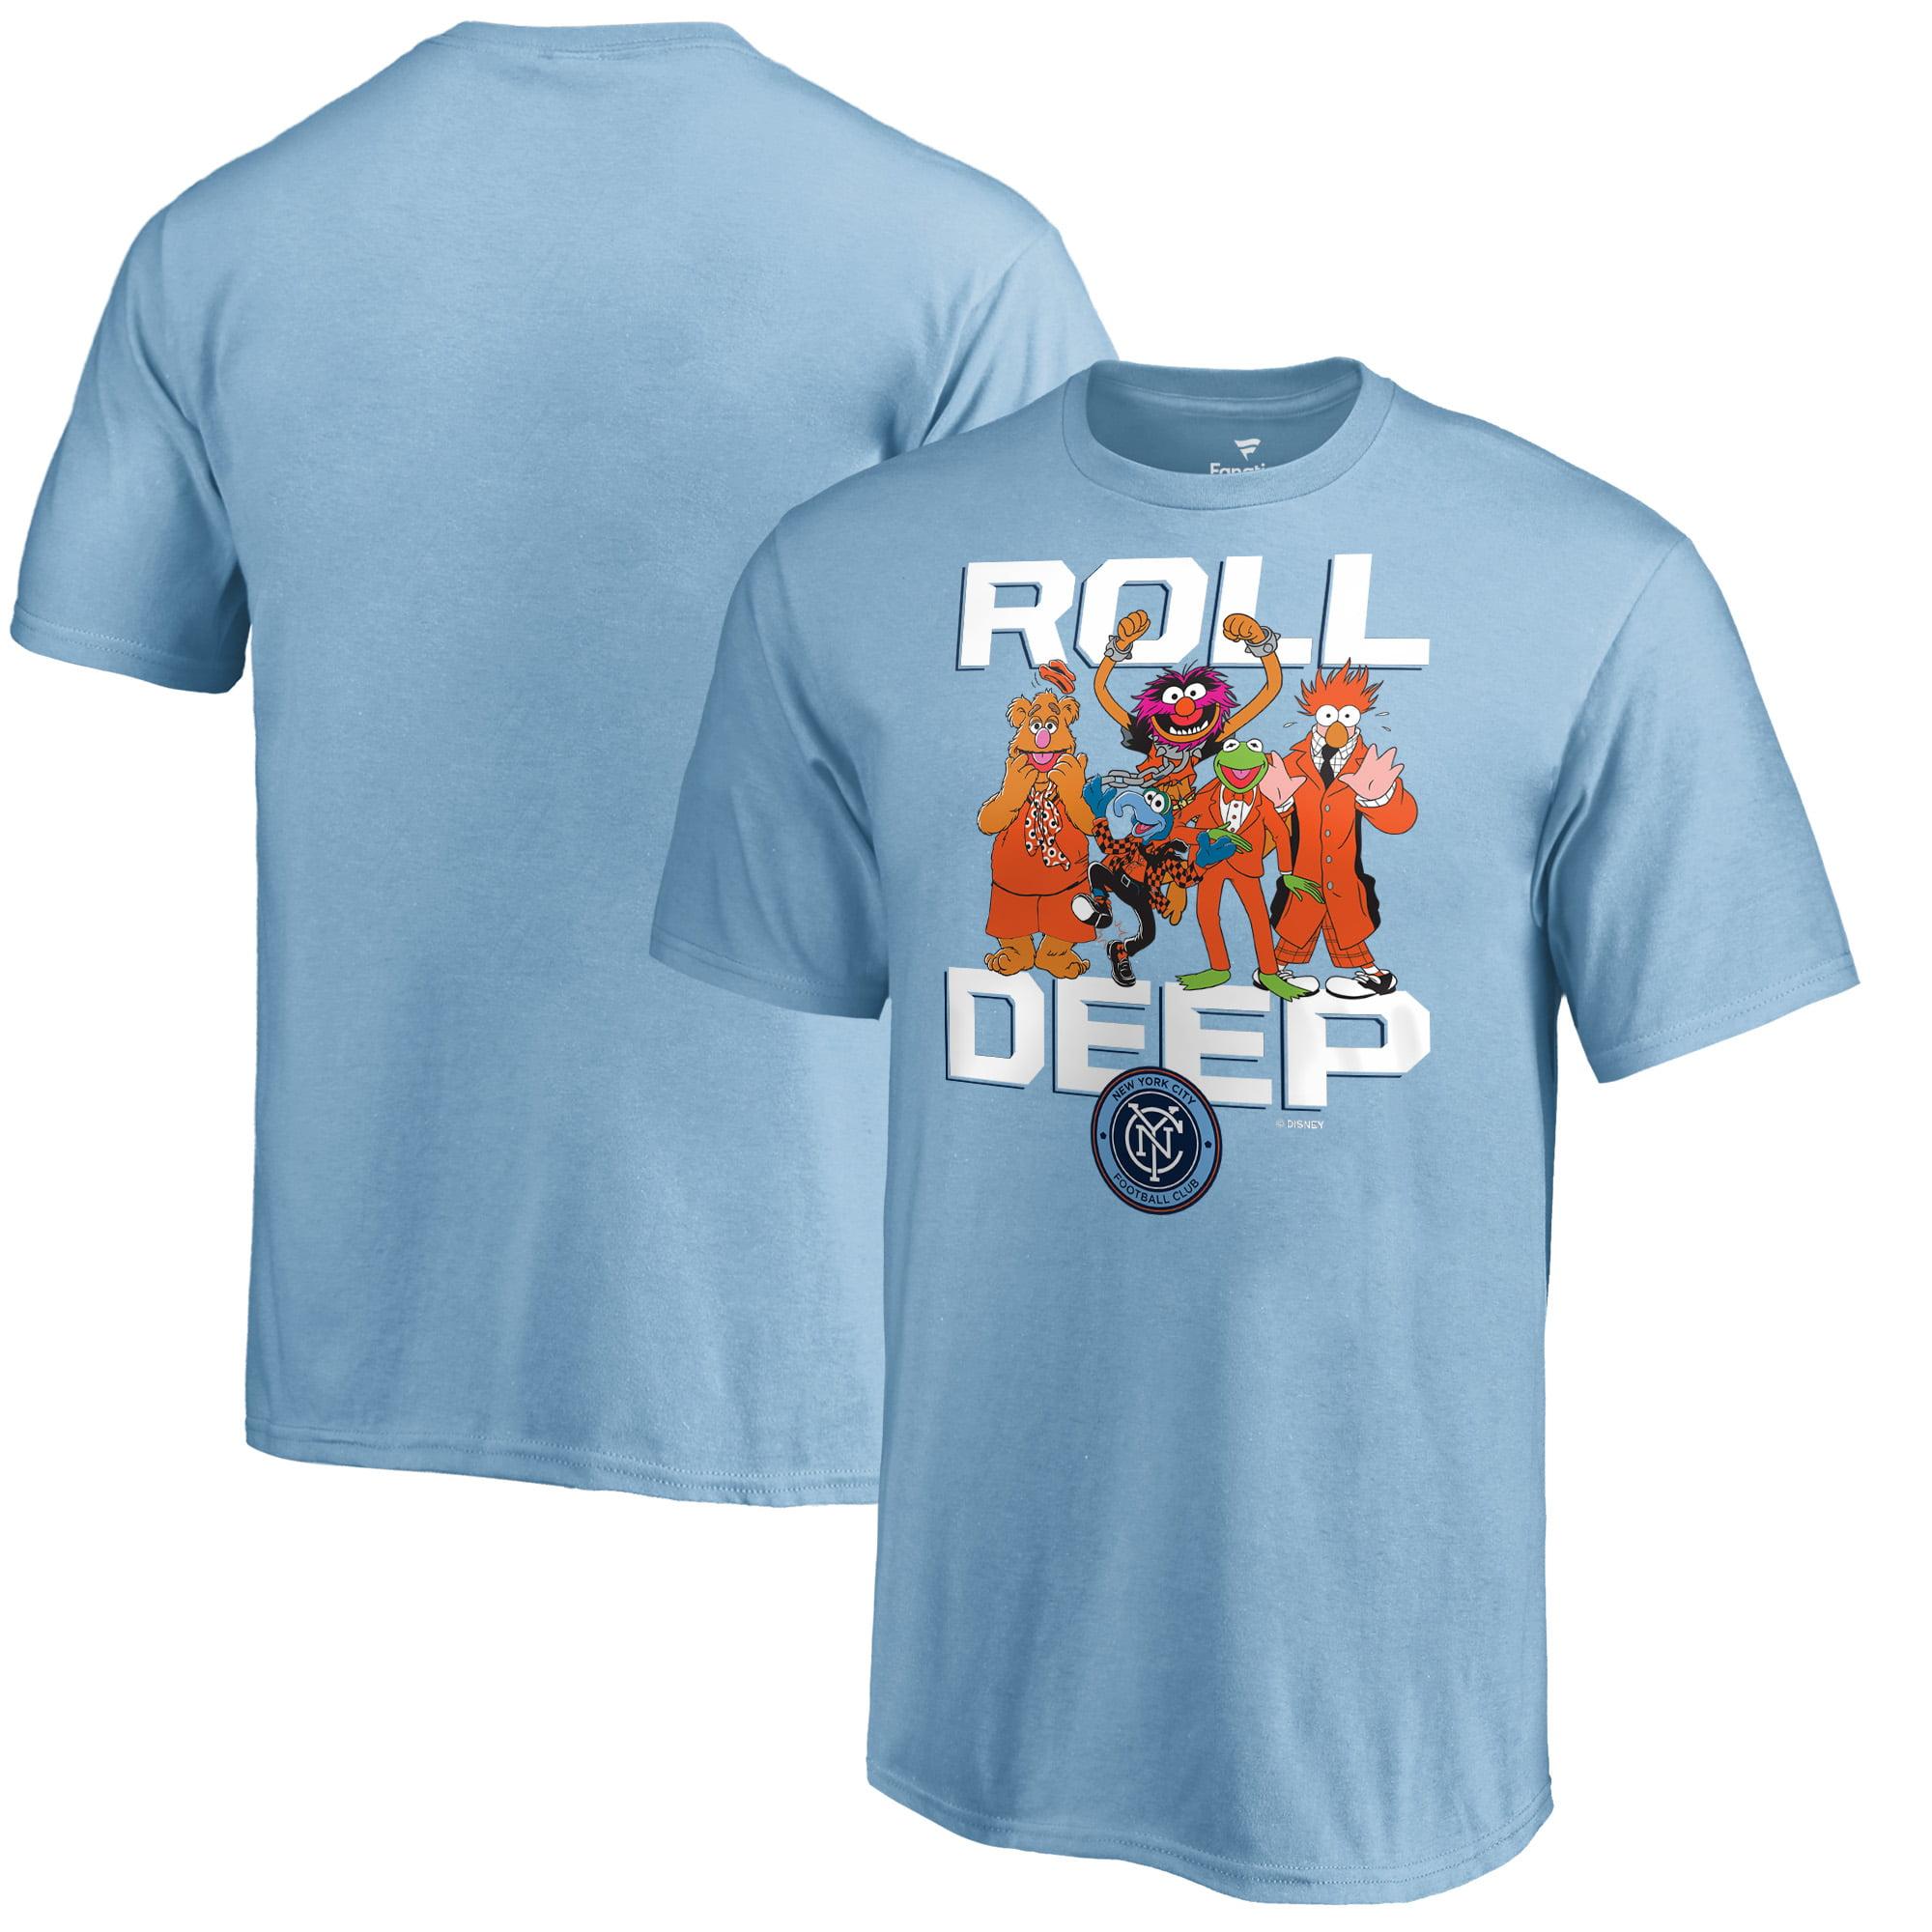 New York City FC Fanatics Branded Youth Disney Roll Deep Muppets T-Shirt - Light Blue